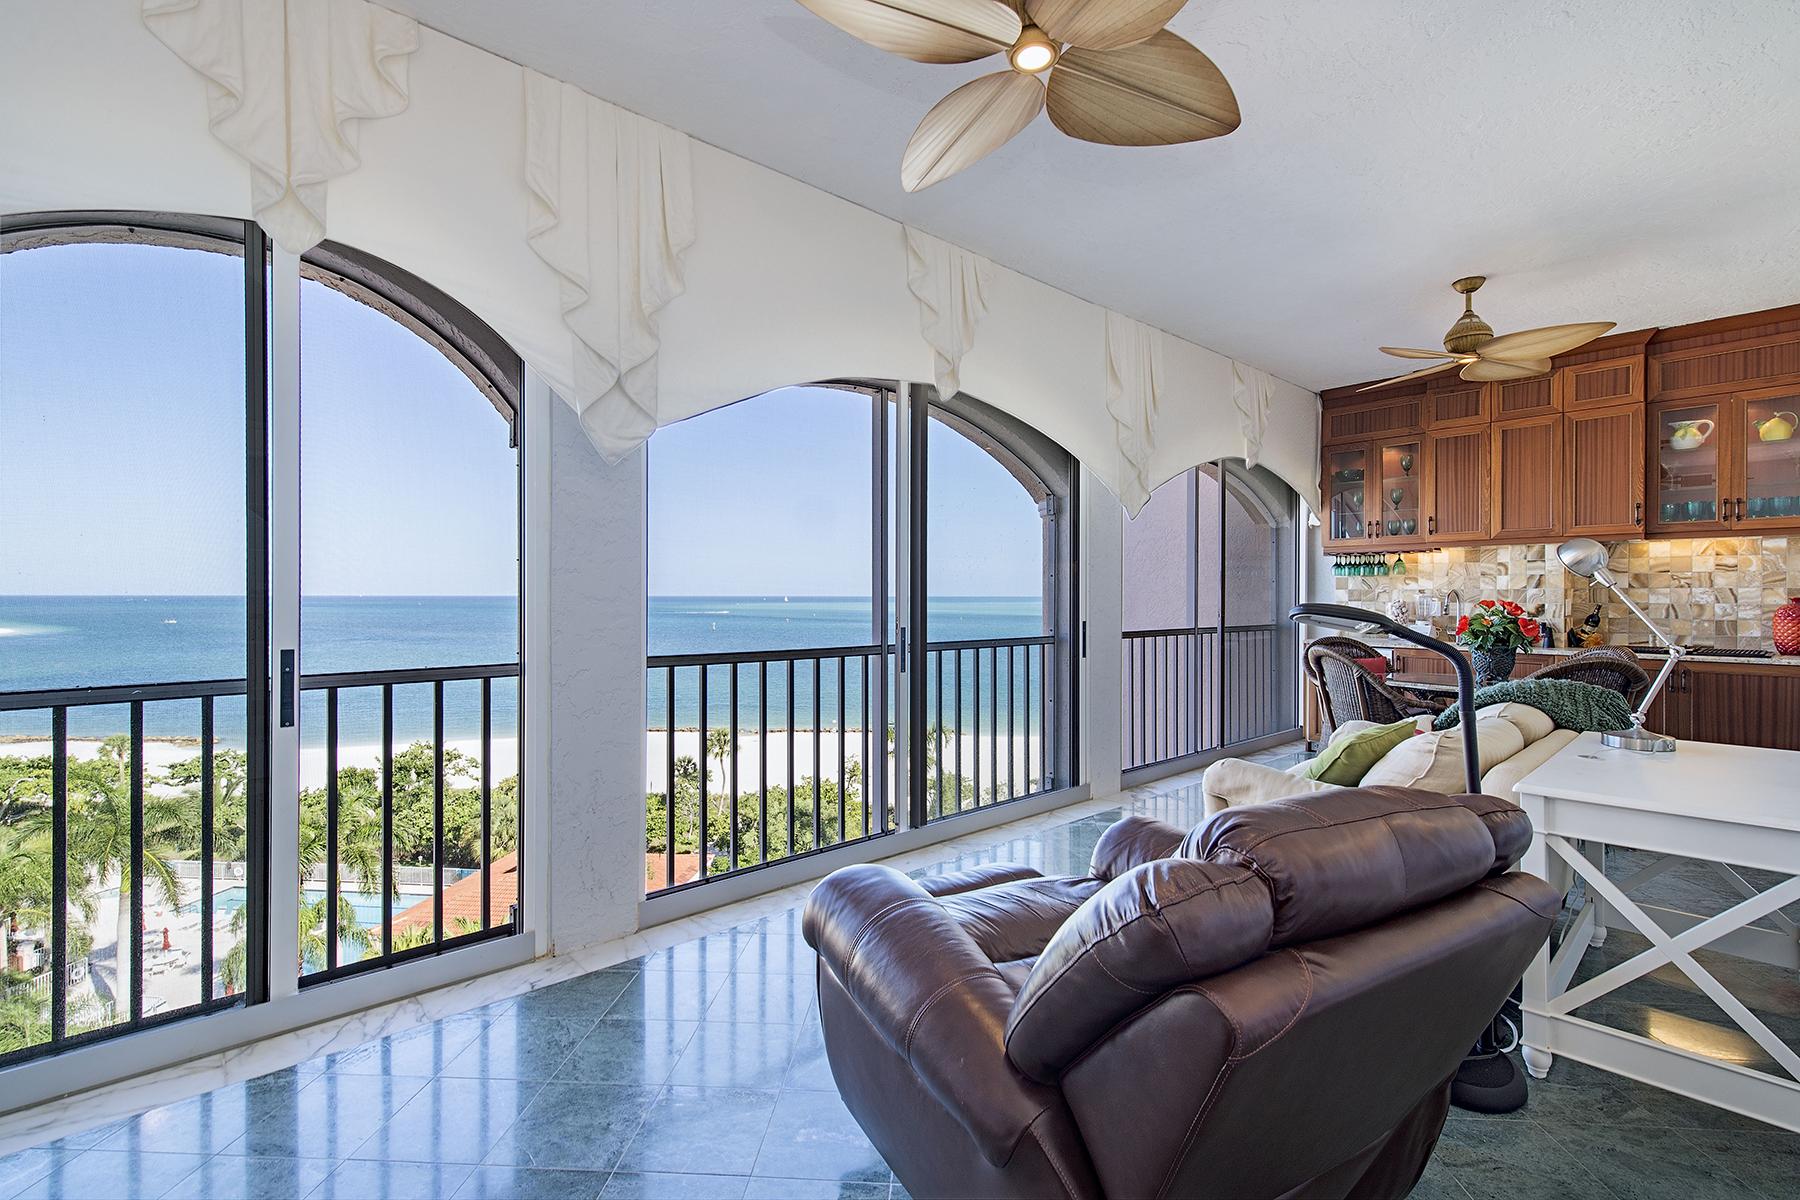 共管物業 為 出售 在 HIDEAWAY BEACH - ROYAL MARCO POINT 3000 Royal Marco Way PH-L Marco Island, 佛羅里達州 34145 美國